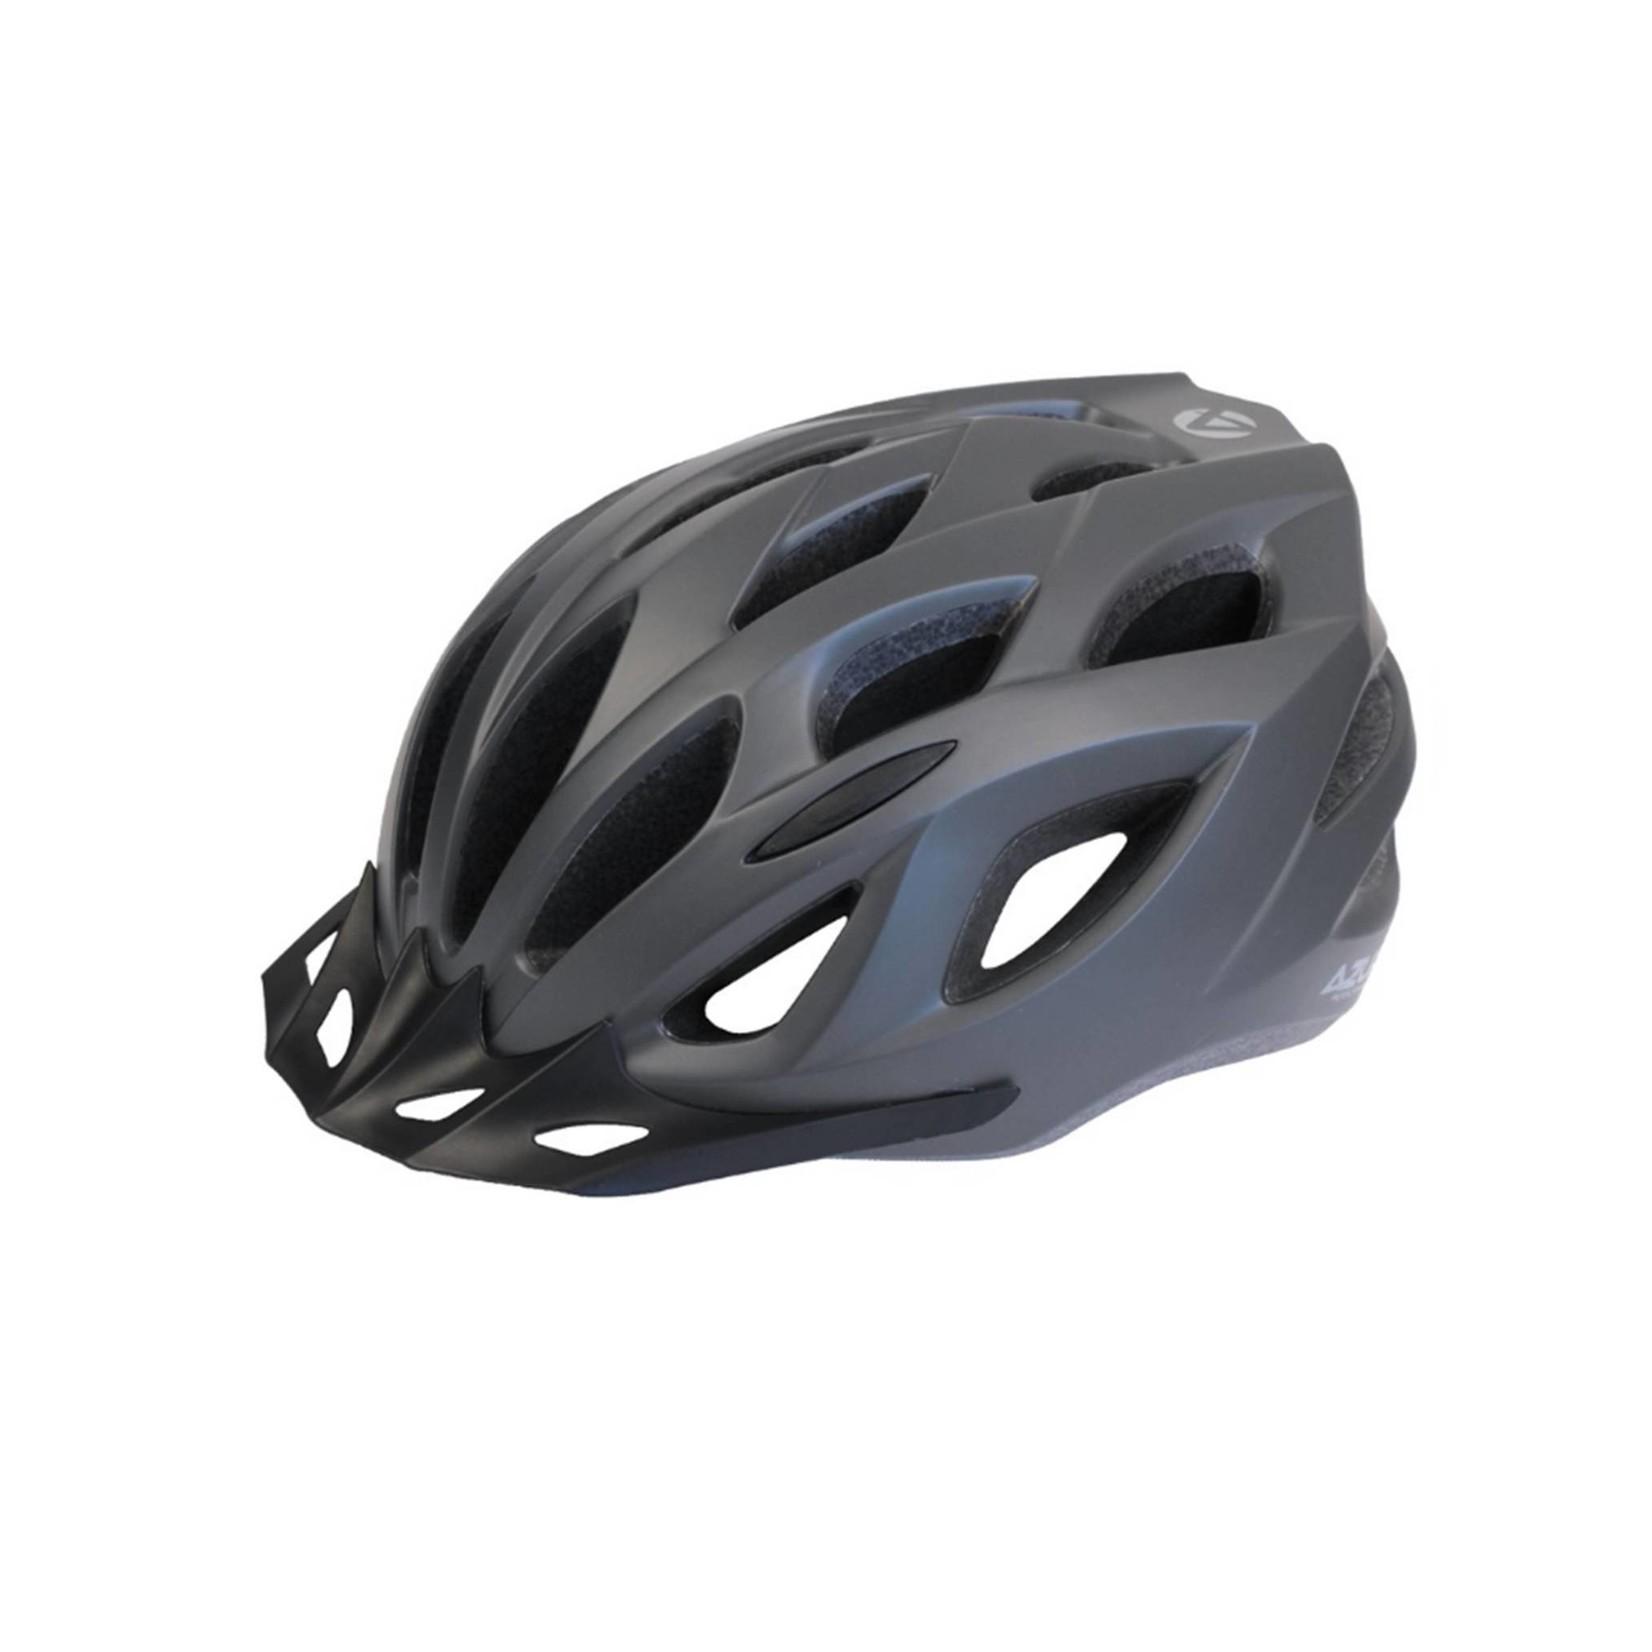 Azur L61 Matt Titanium Helmet